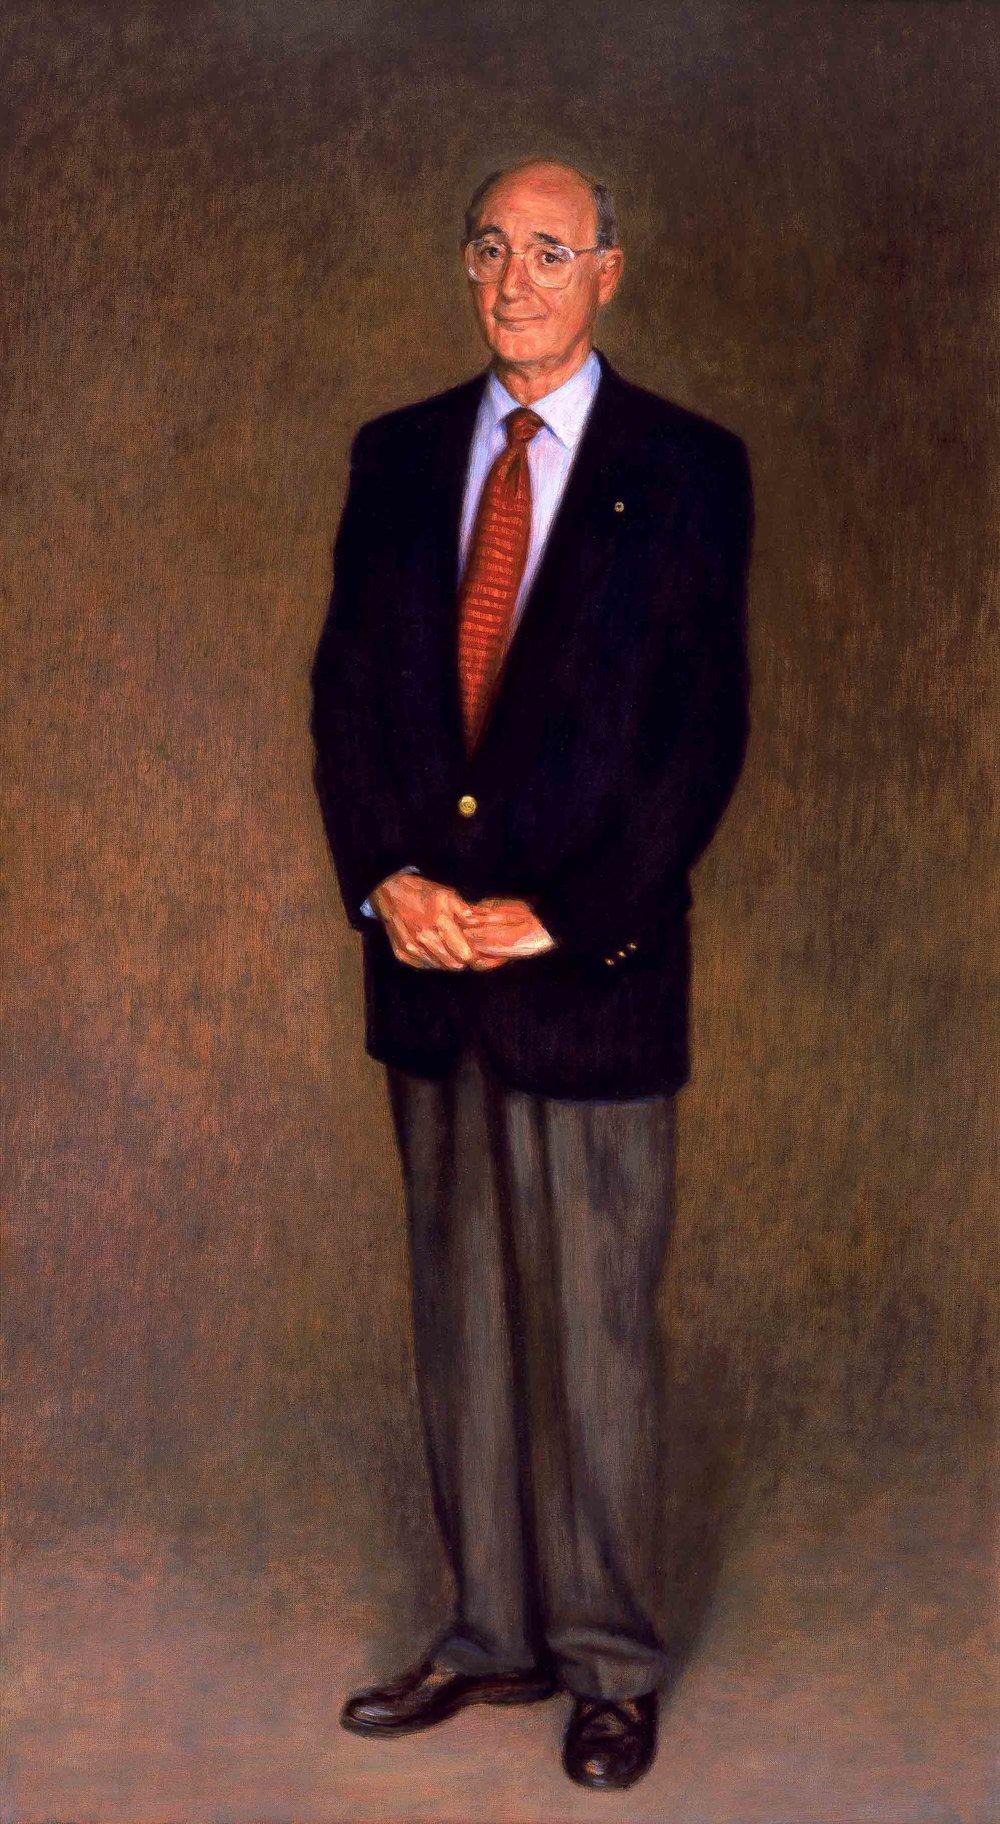 Professor Peter Castaldi (1999)